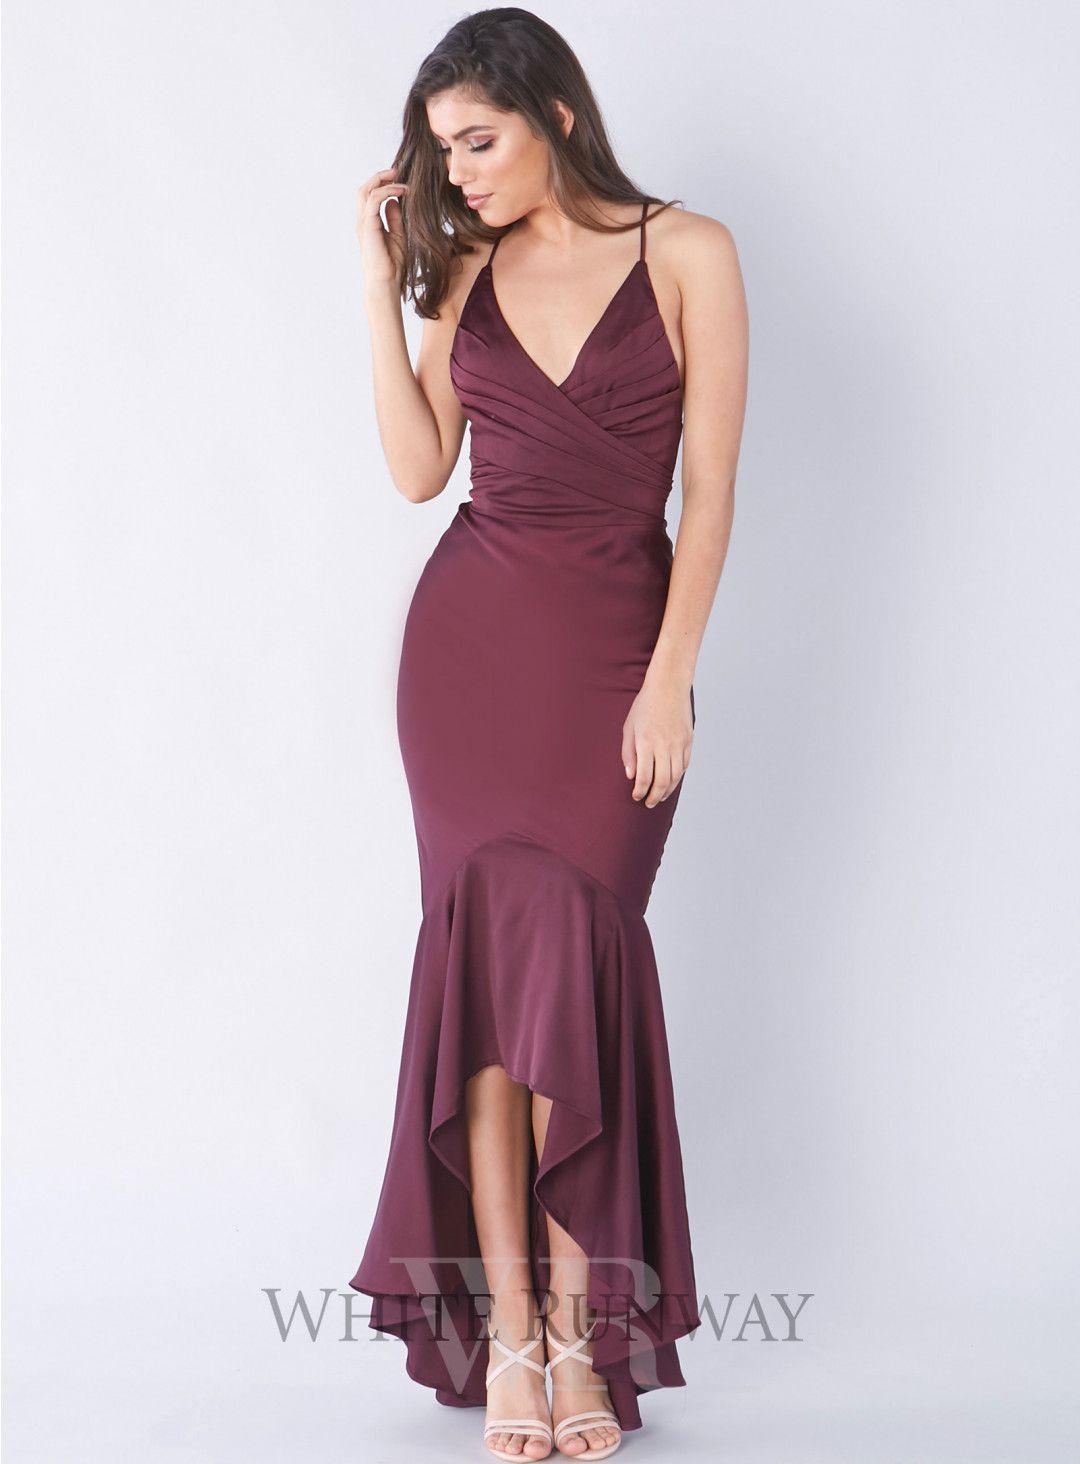 Julietus delight gown bridesmaid u groomsmen pinterest gowns